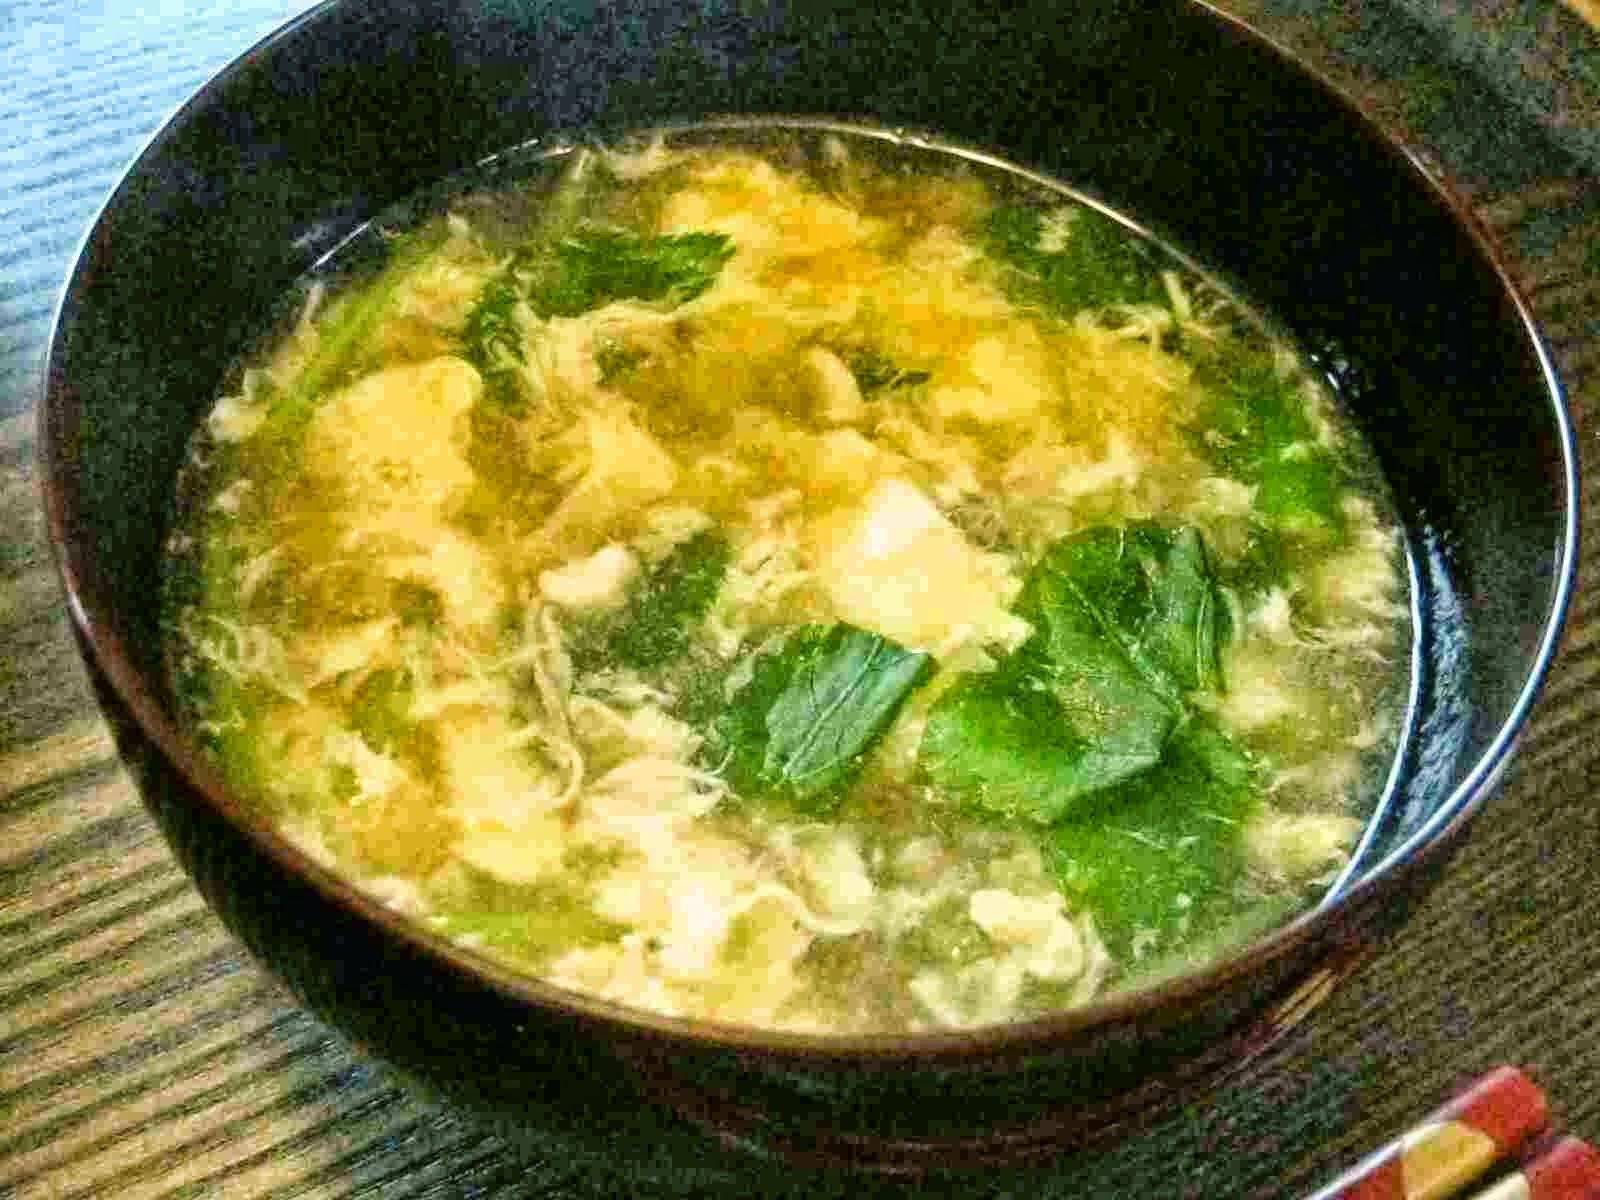 Recipes for Tom Kakitamajiru mitsuba iri egg flower clear soup with mitsuba